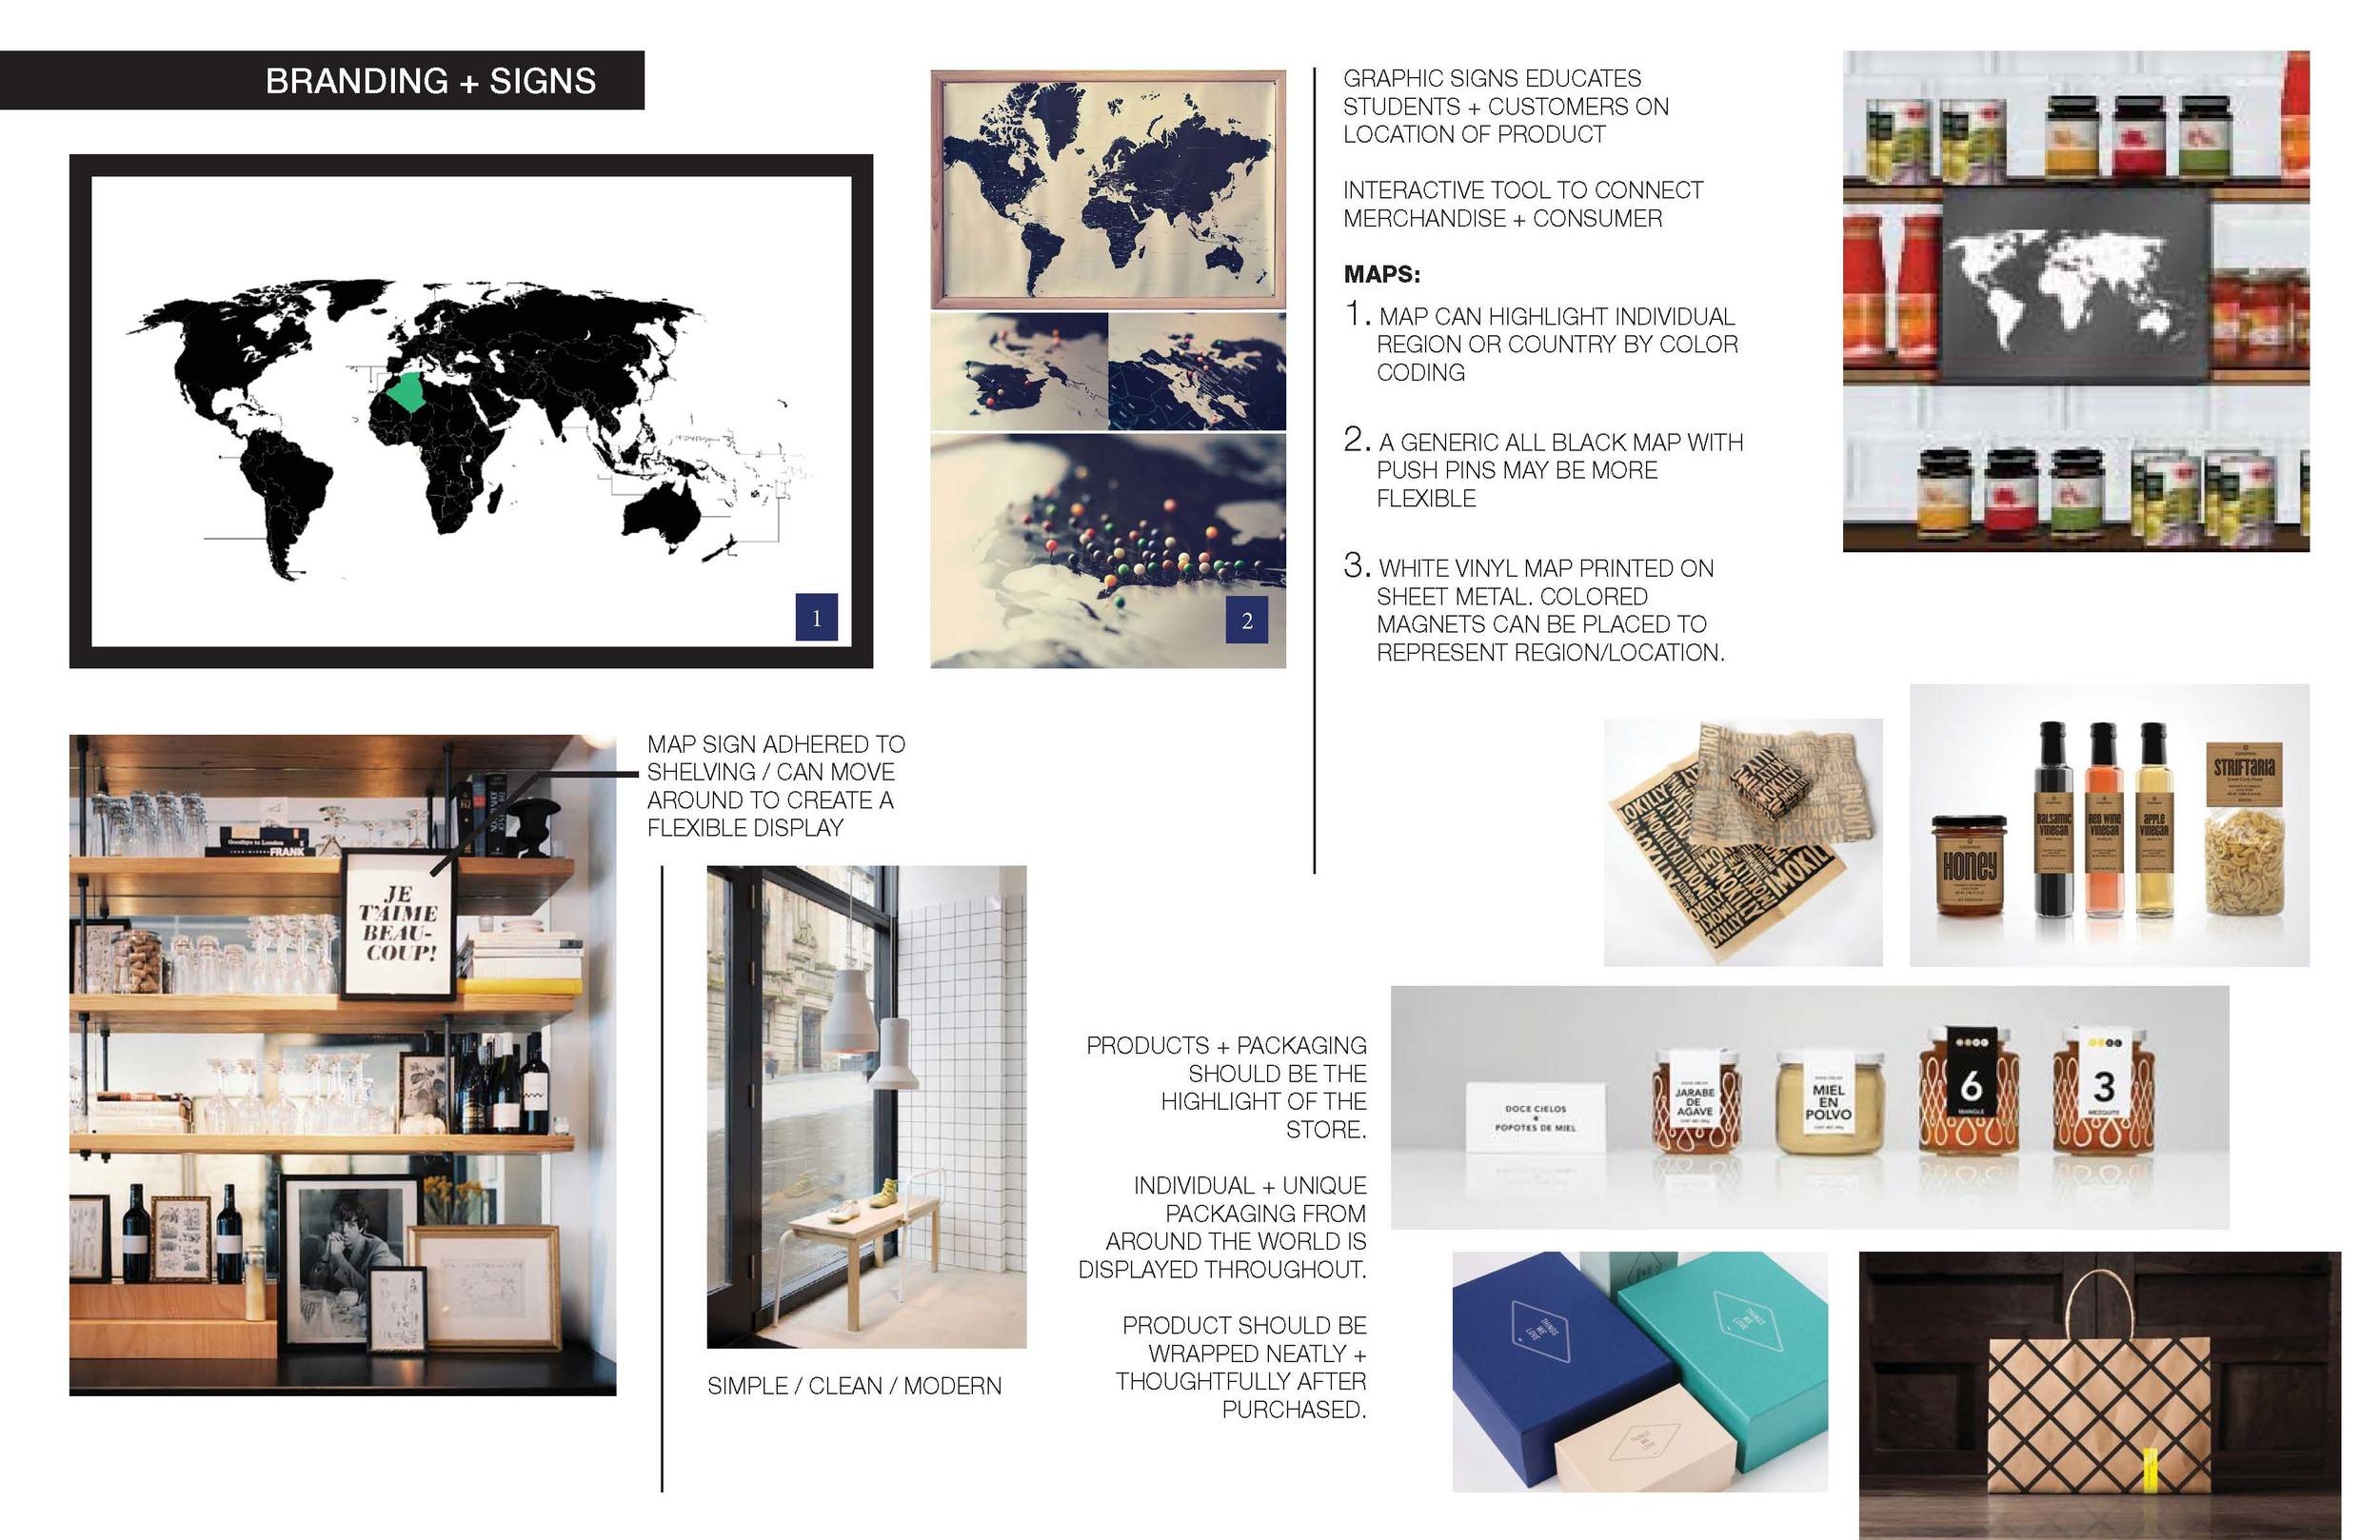 130122_InternationalMarket_Vision_Page_5.jpg